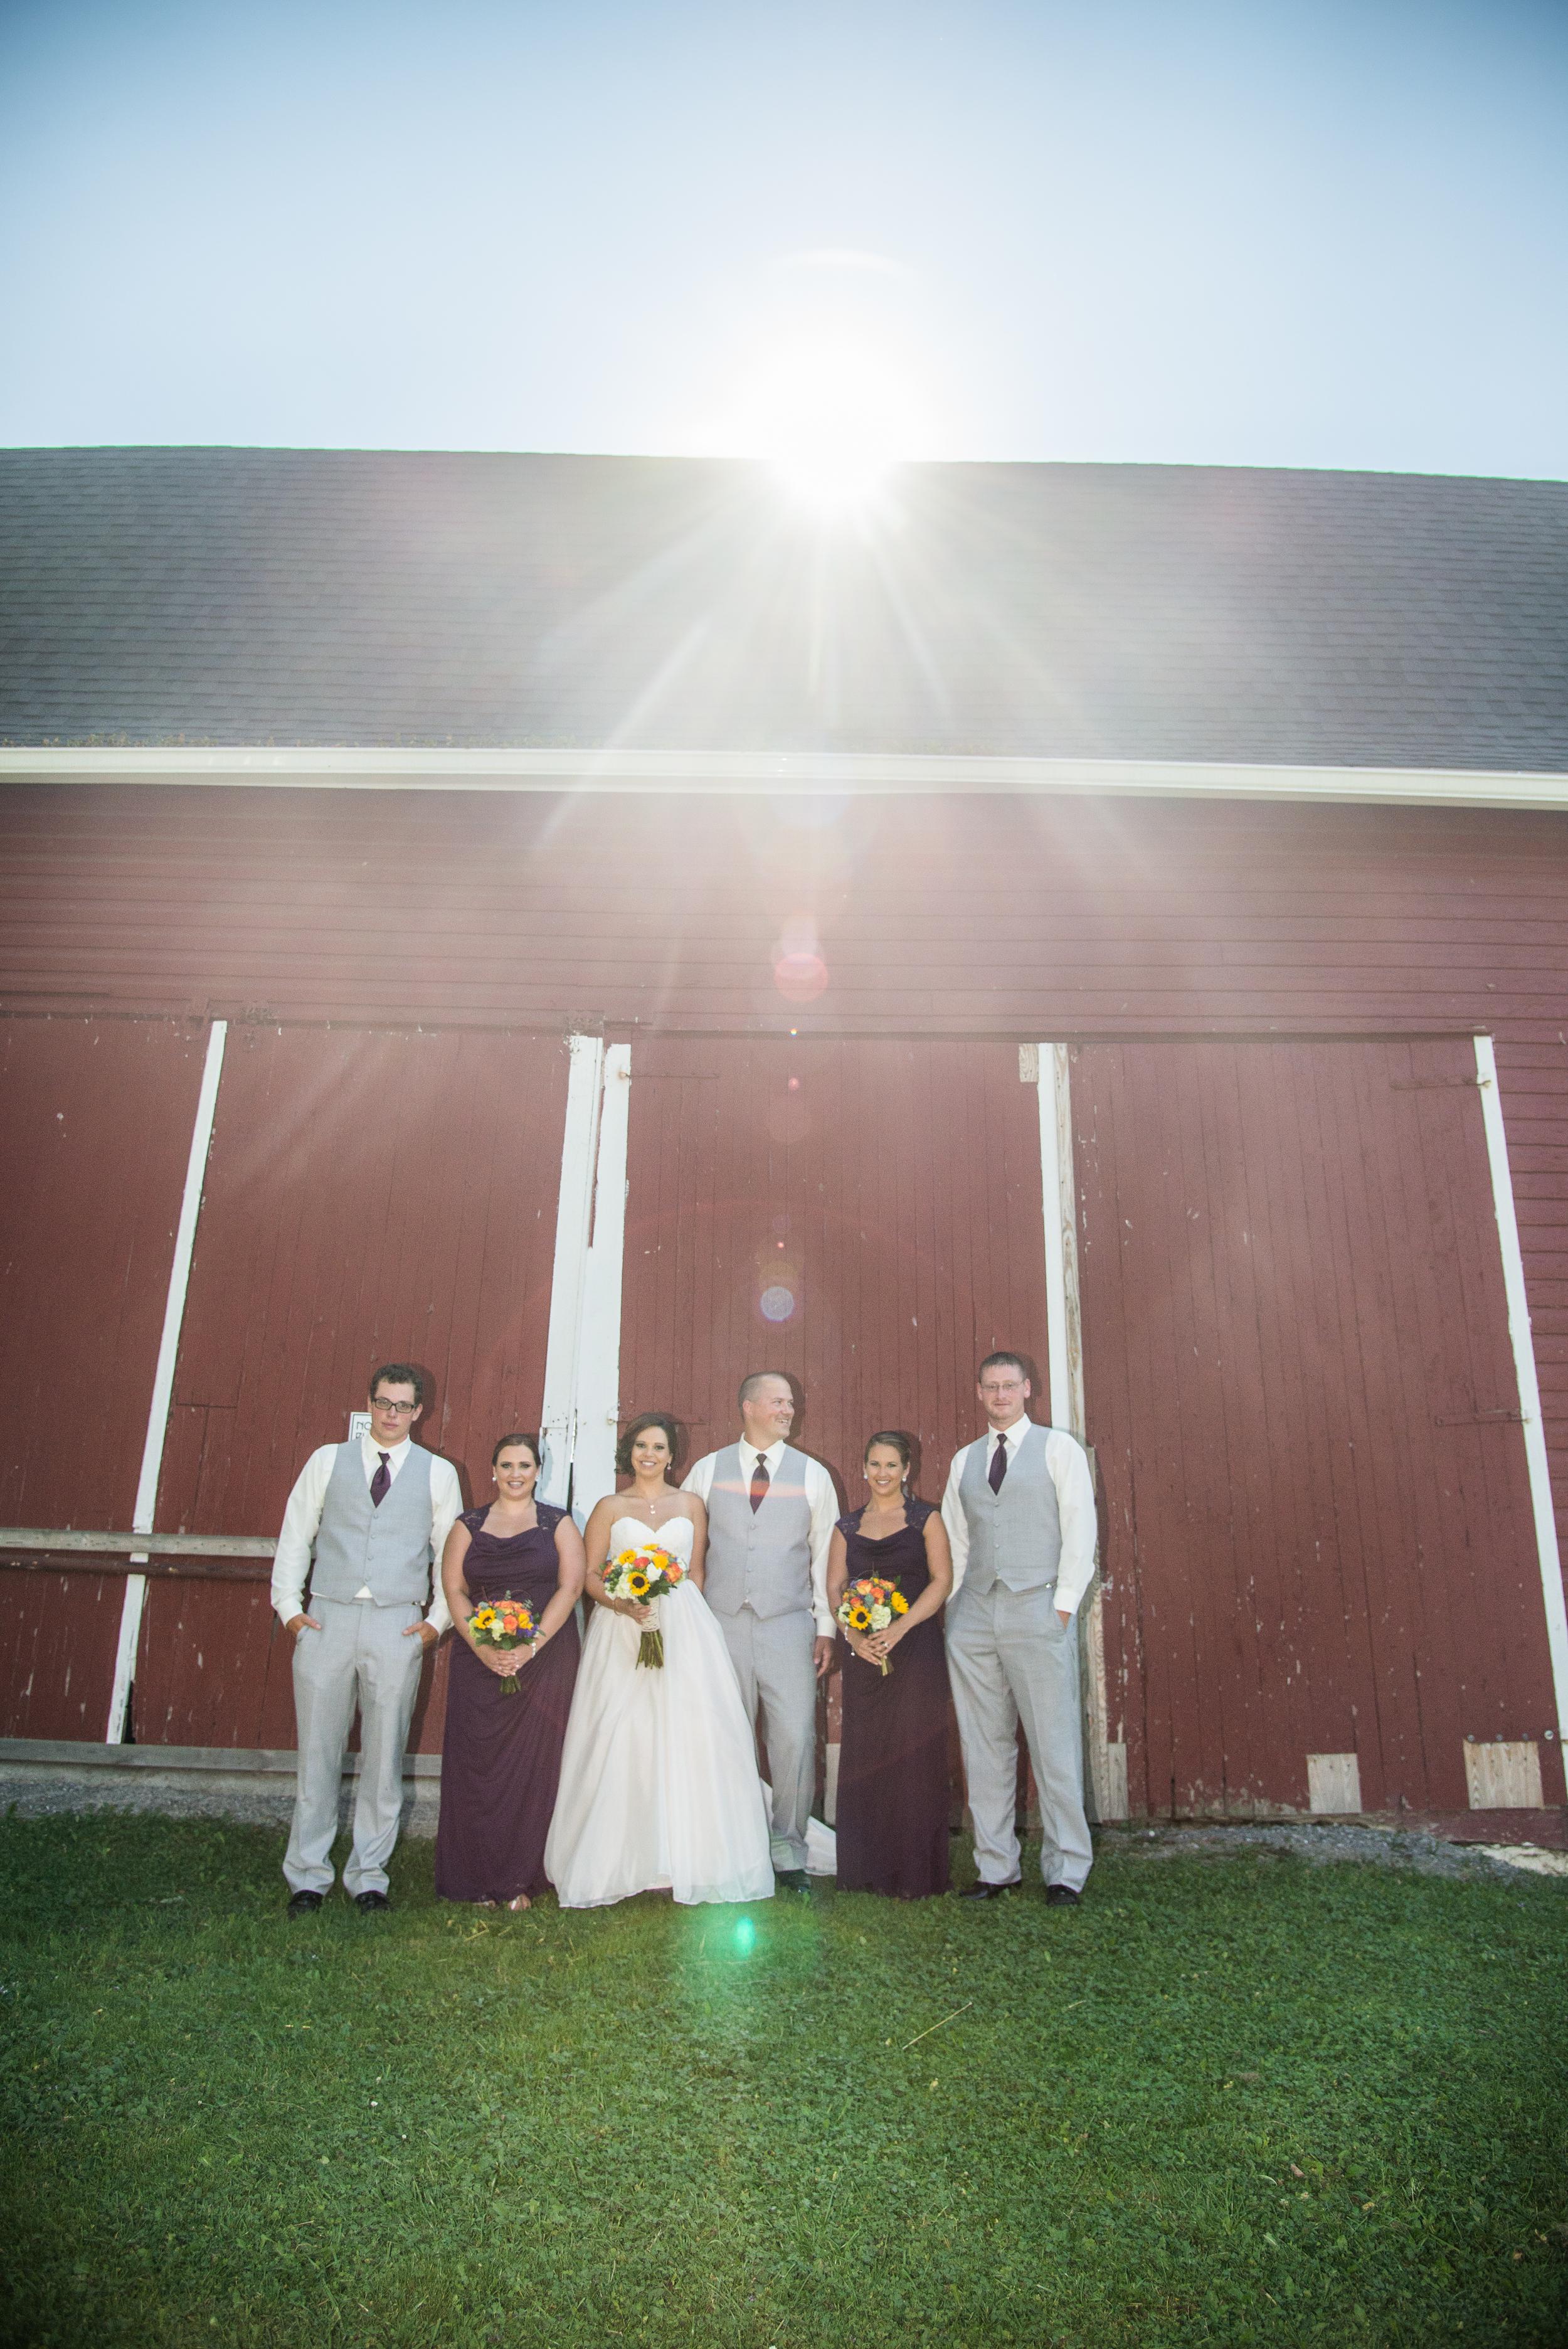 Buffalo | Lauren Ashley Photography | www.laurenashleyphoto.com | Wedding Photographer |knox farms |3.jpg